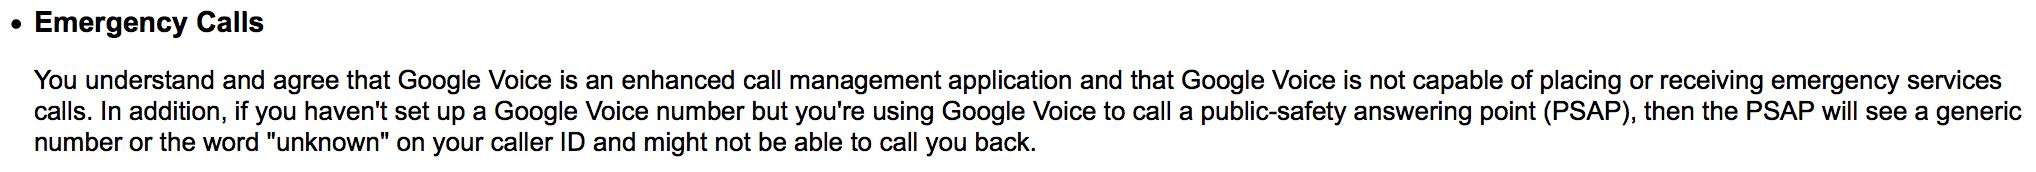 Google Voice ToS